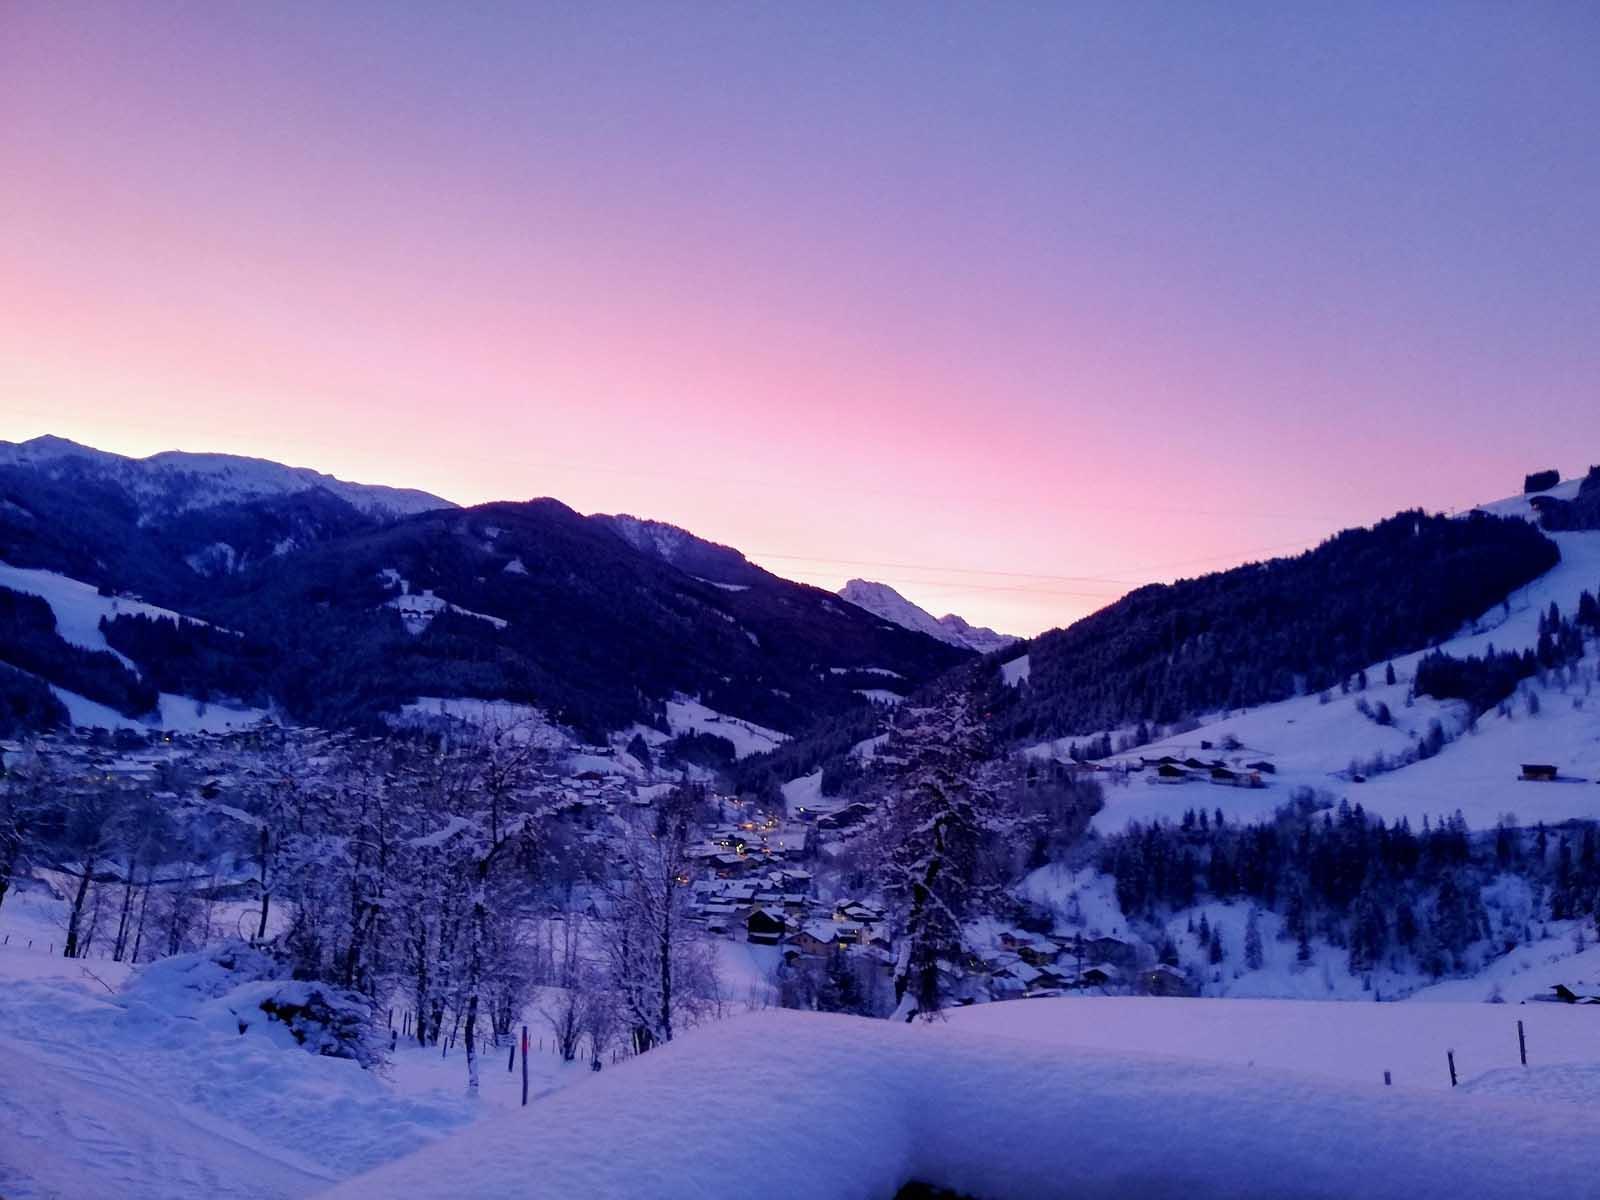 Morning atmosphere in winter in Salzburgerland